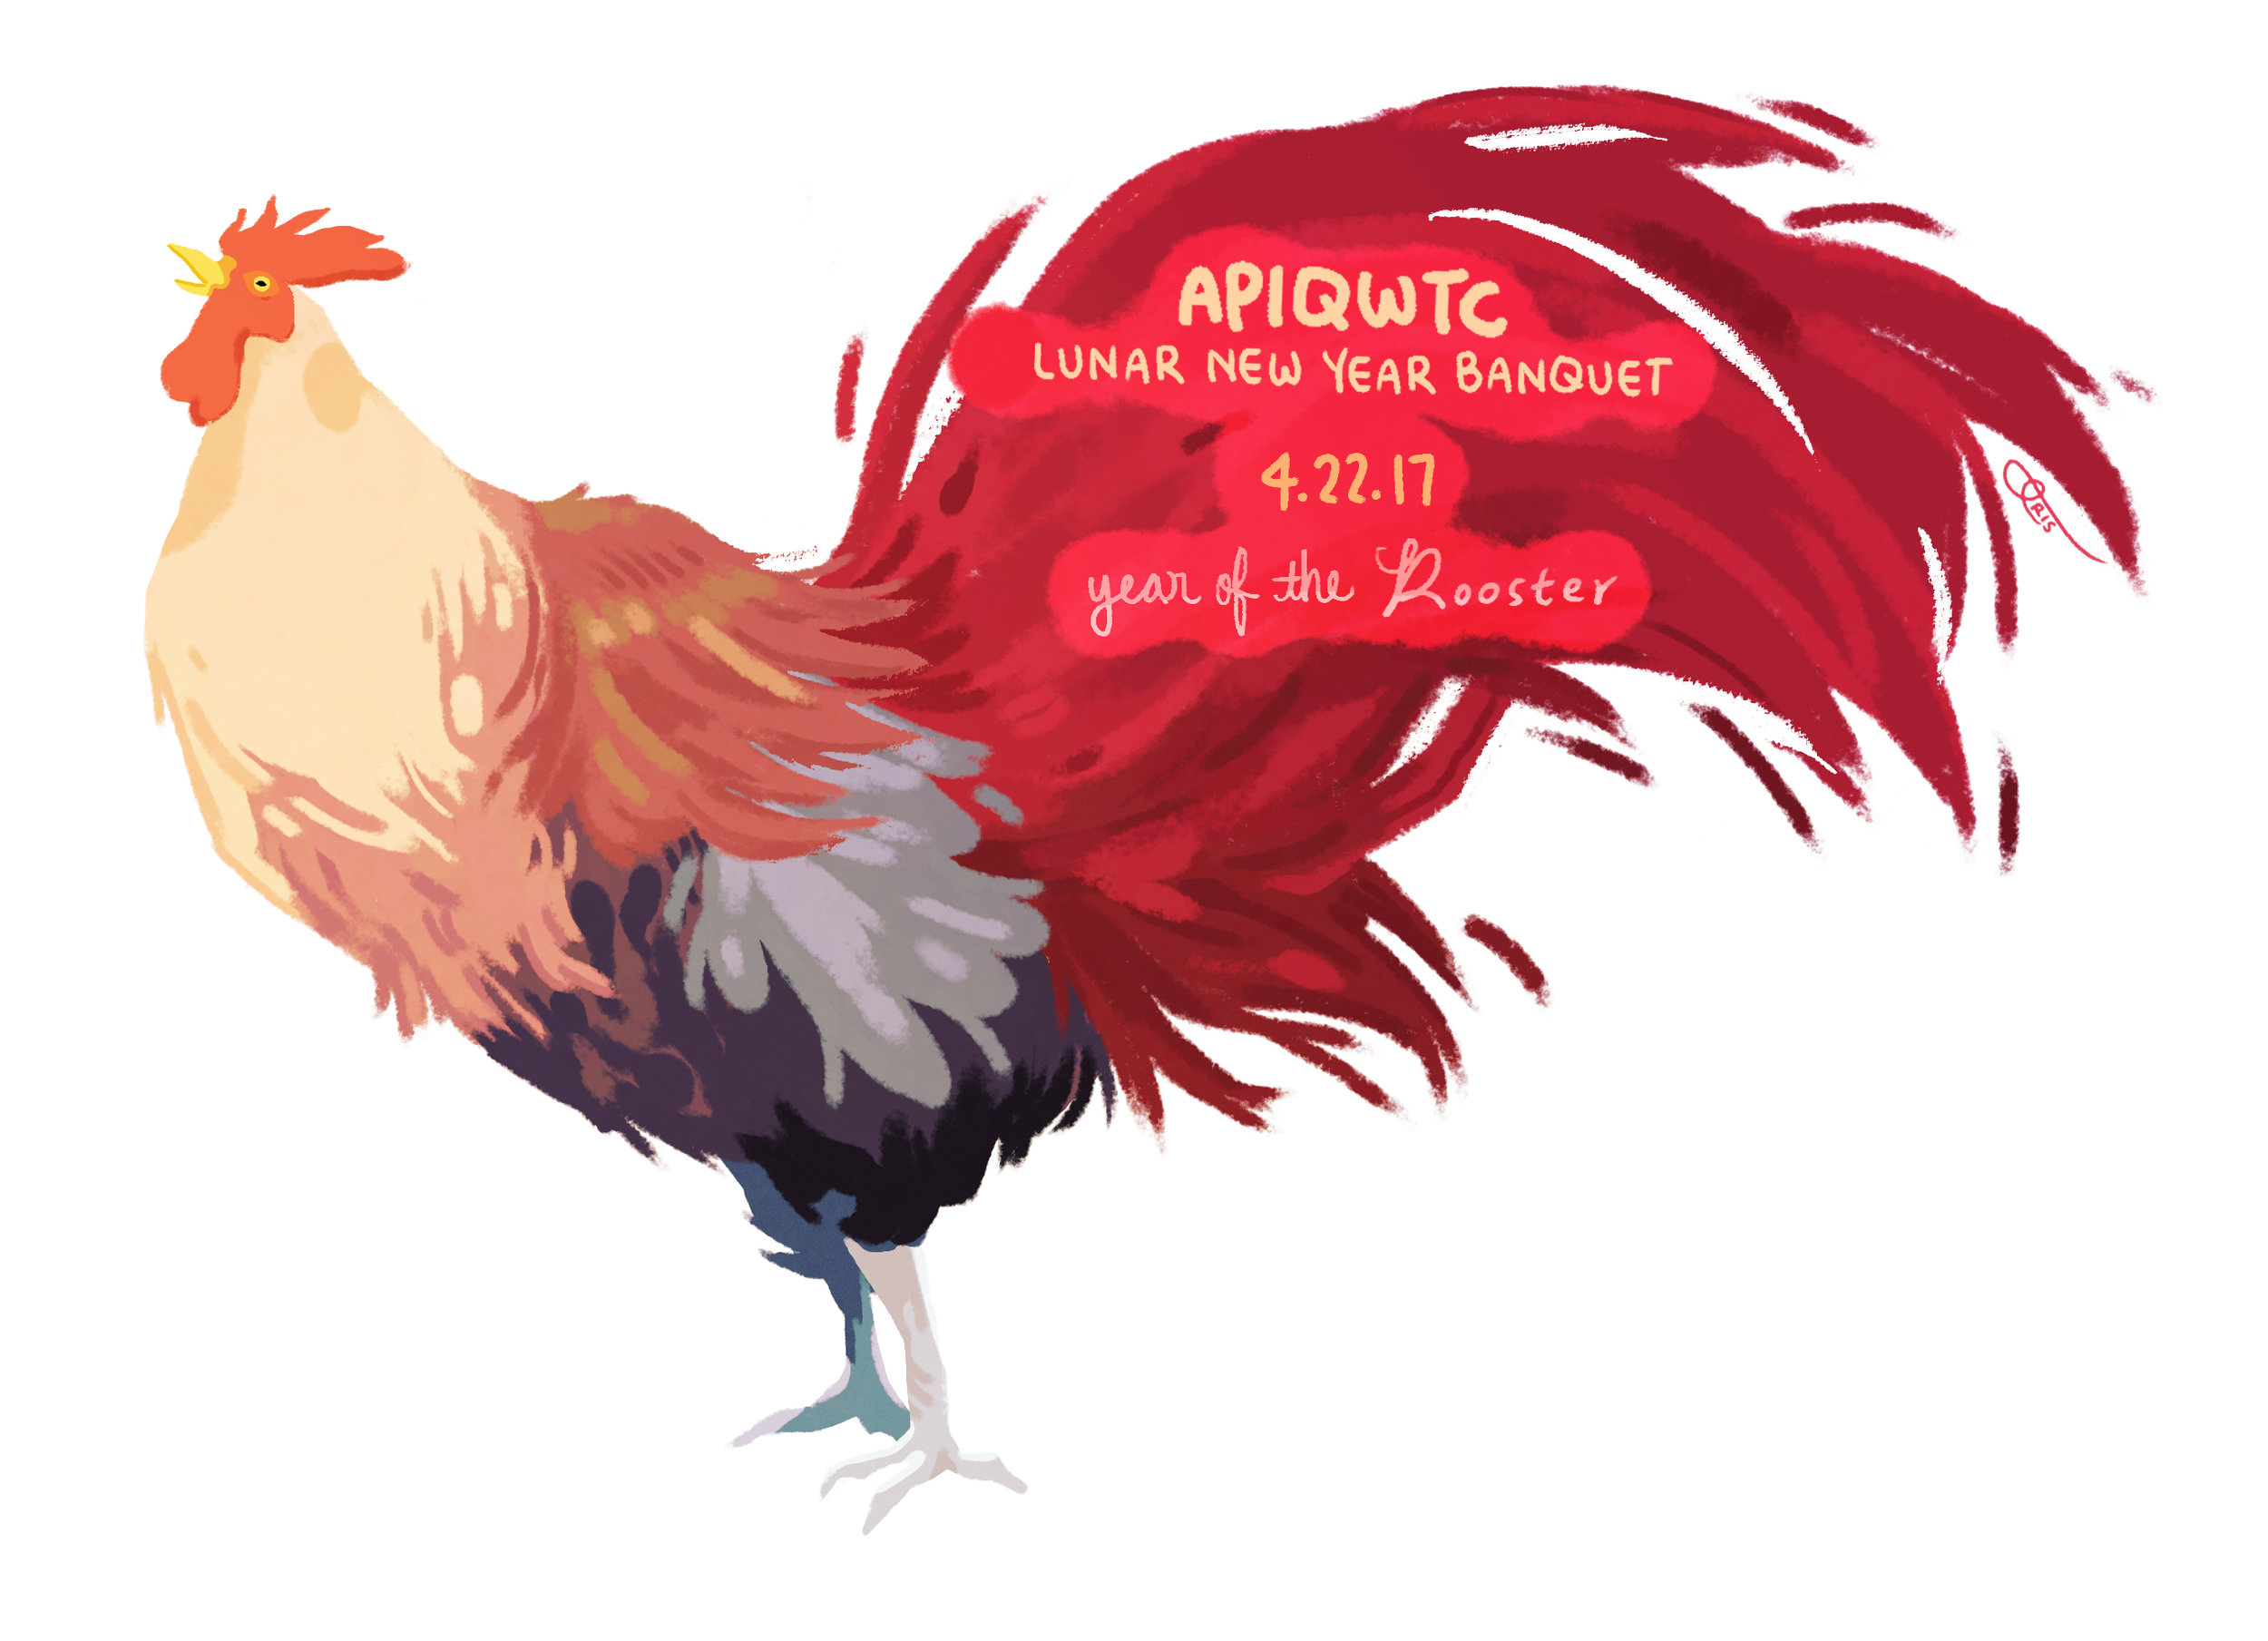 APIQWTC Banquet Program Art.jpg